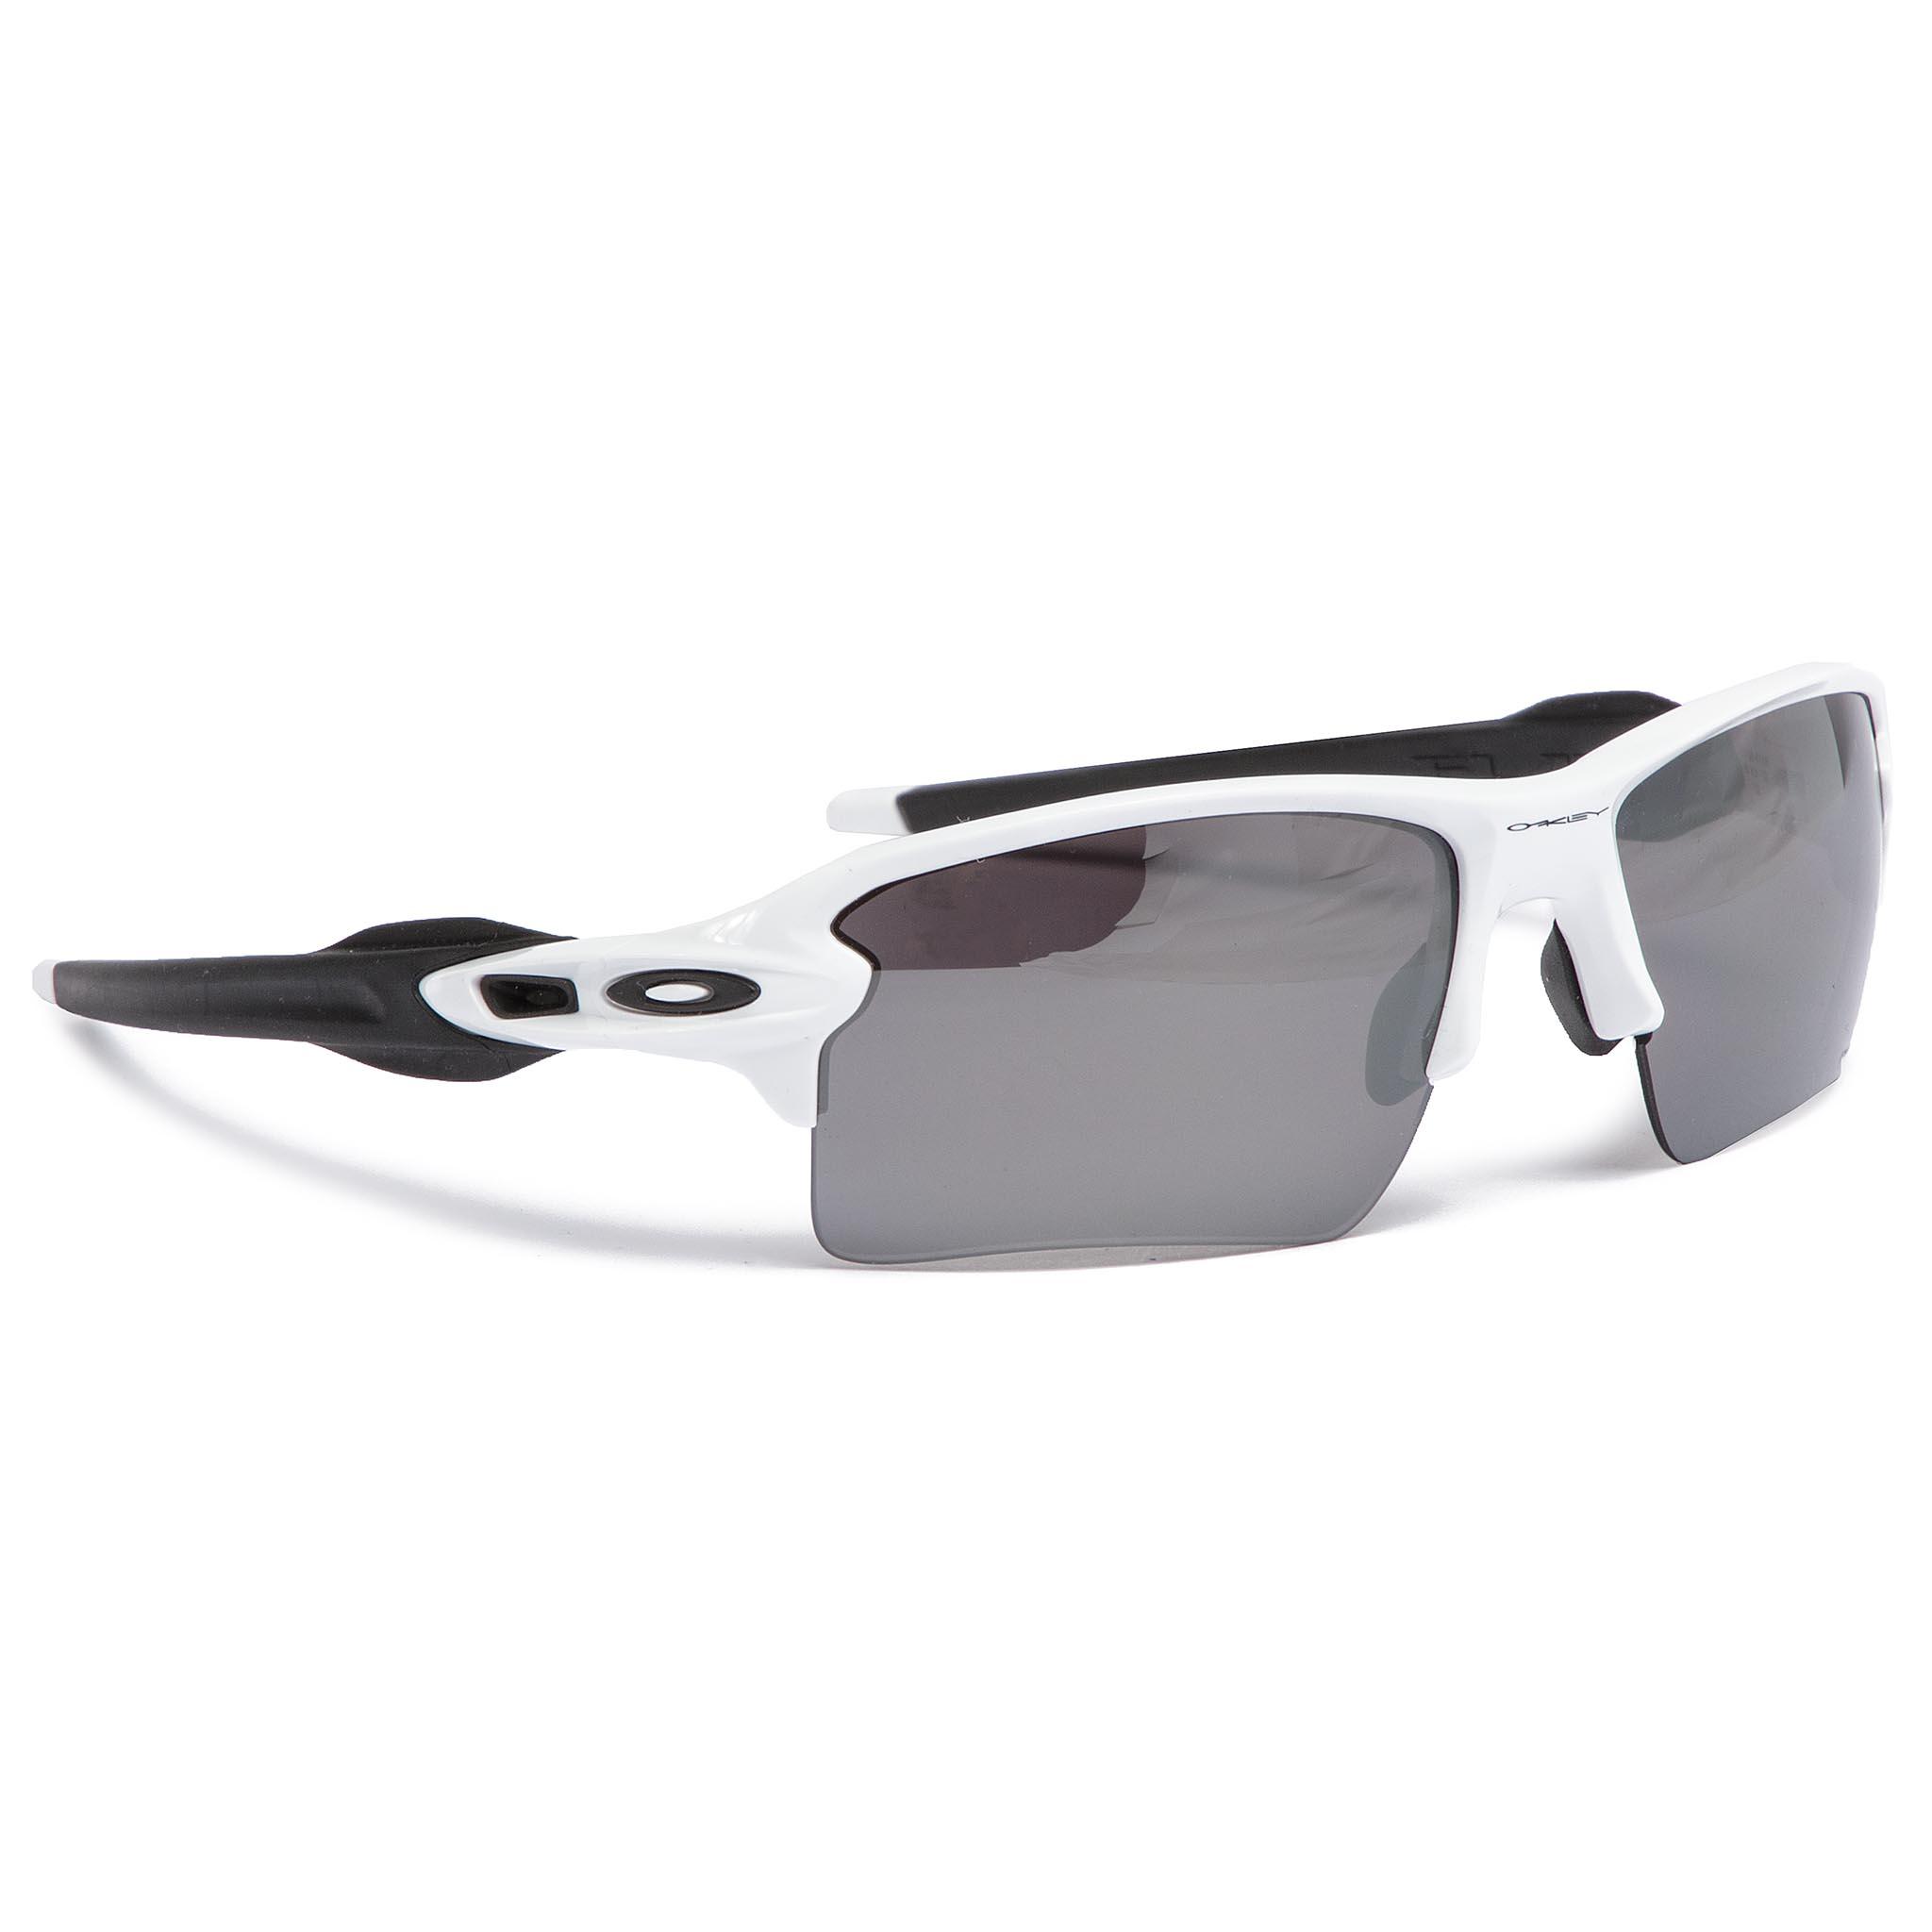 Slnečné okuliare OAKLEY - Flak 2.0 Xl OO9188-8159 Polished White ... c0762ef4f18